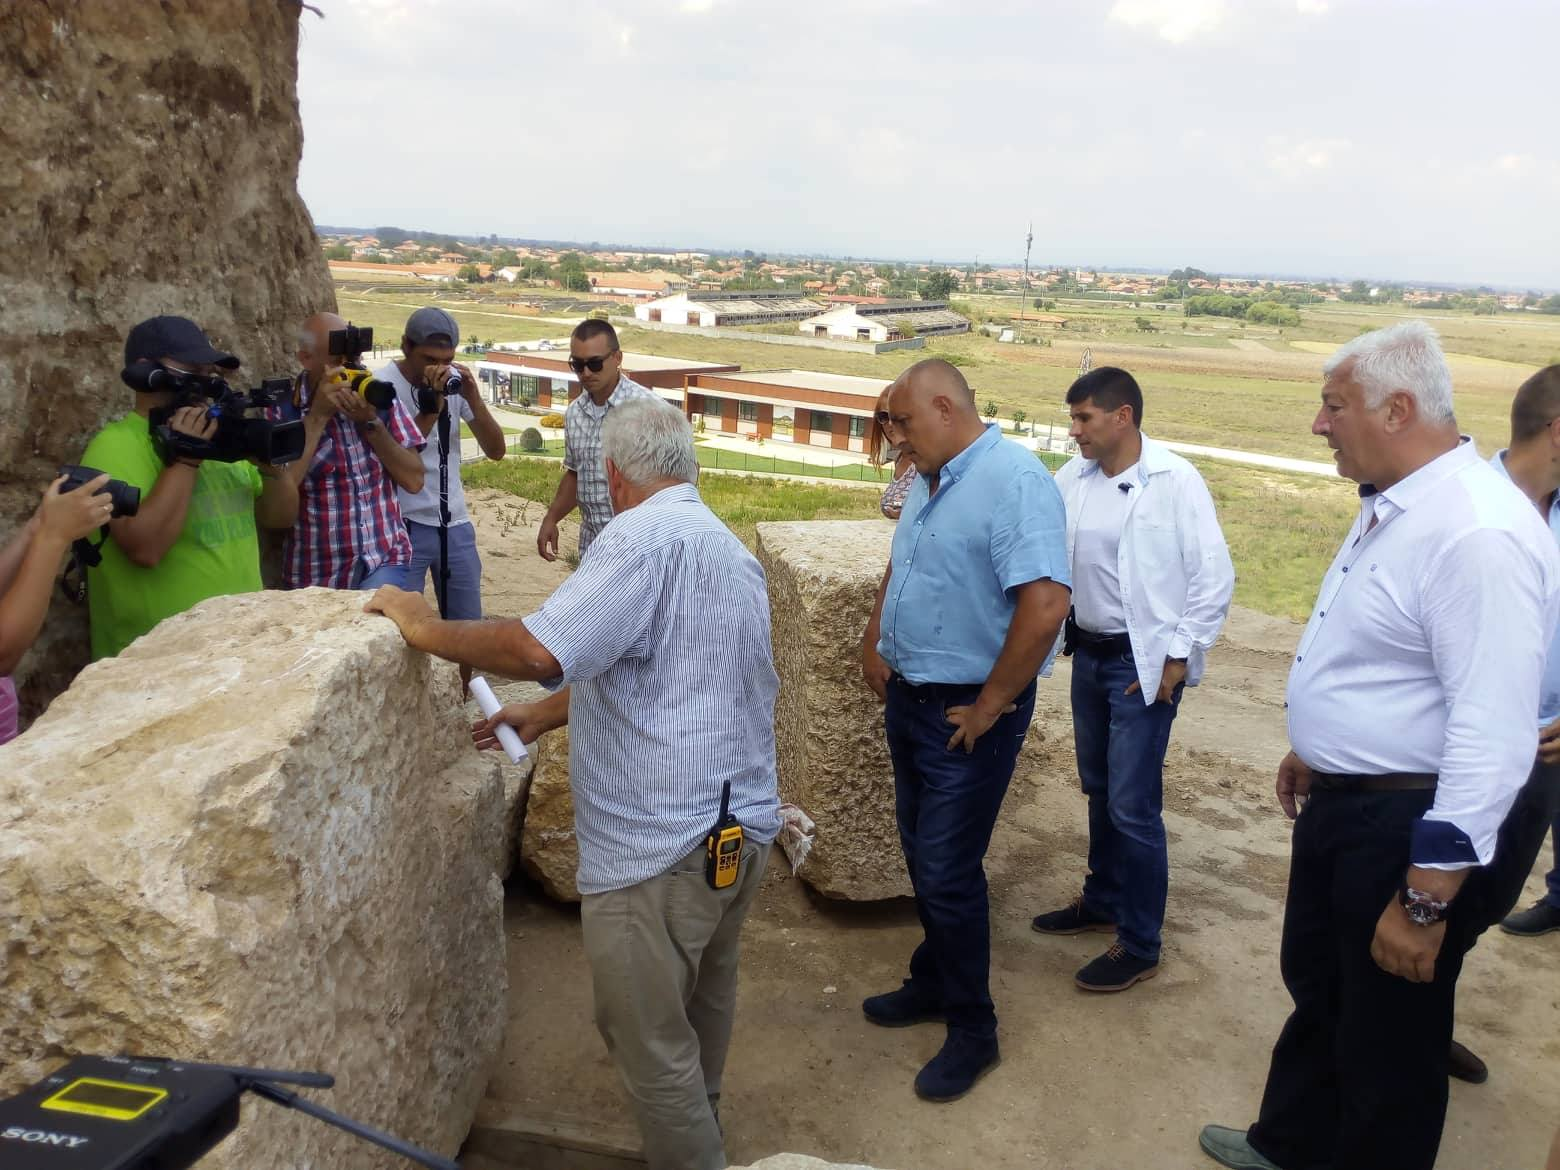 Thracian-Tomb-Maltepe-Ziggurat-Roman-Emp